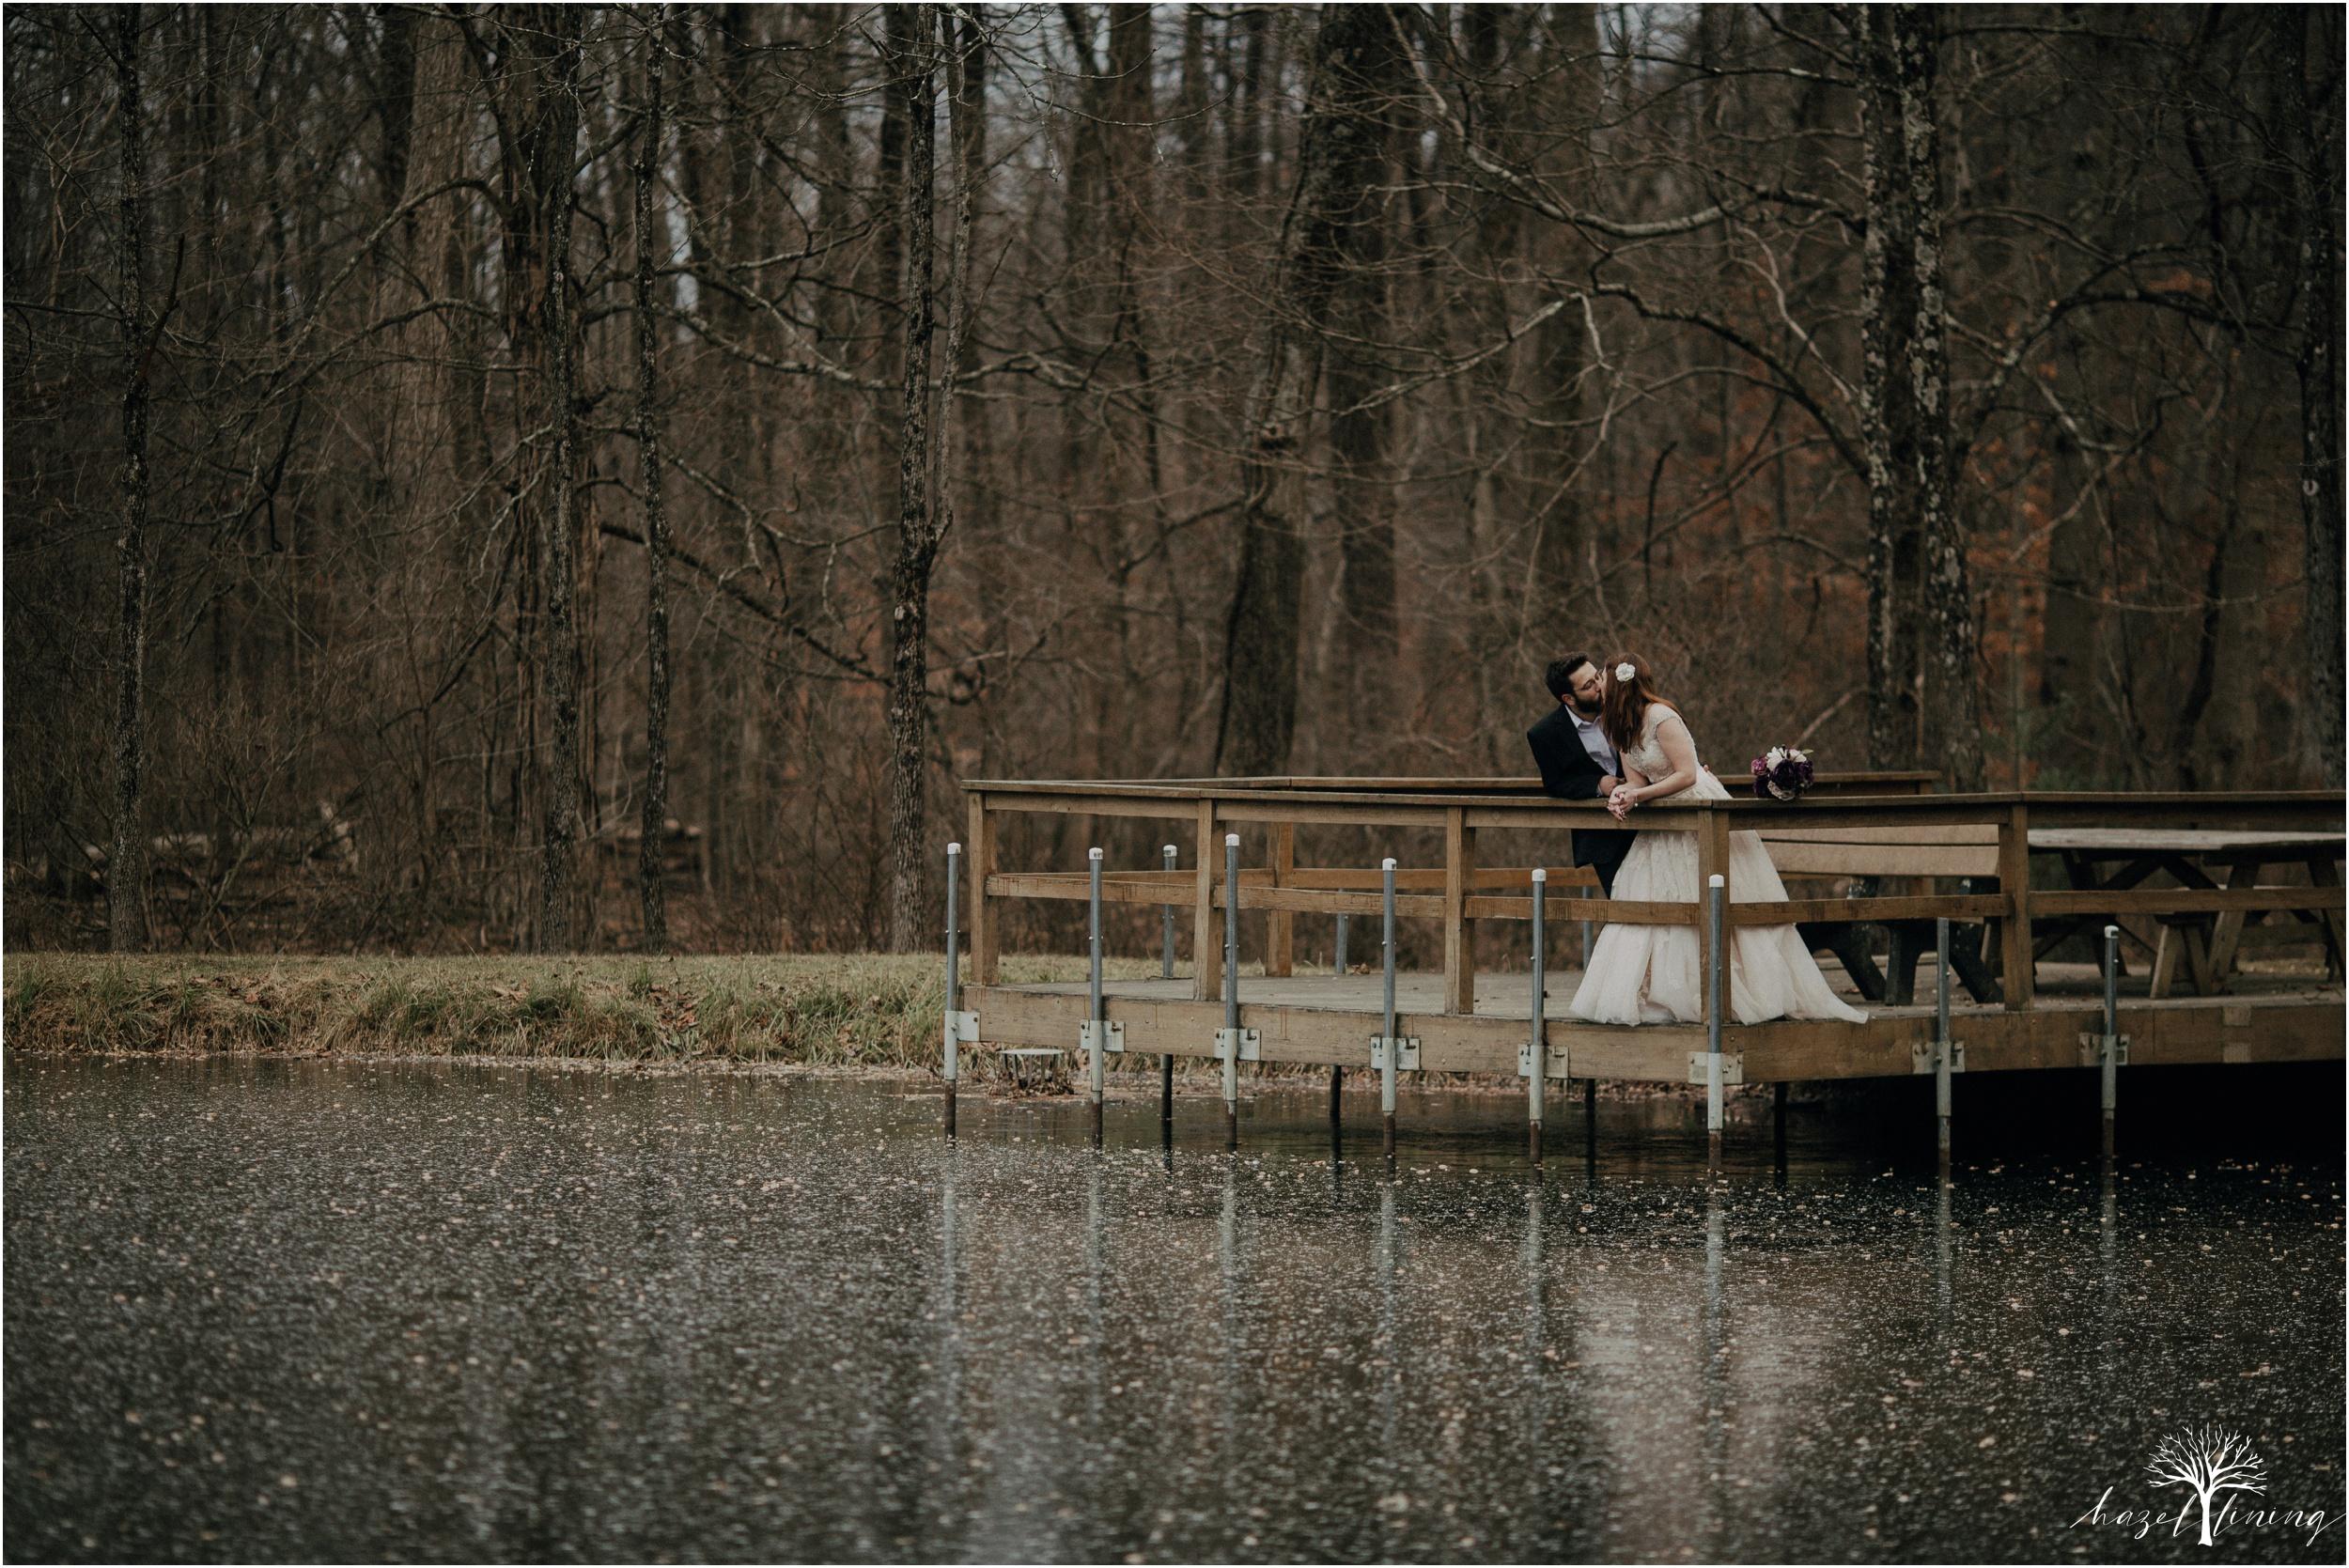 evan-maggie-lesh-one-year-anniversary-winter-shoot-camp-menolan-pennsylvania_0073.jpg